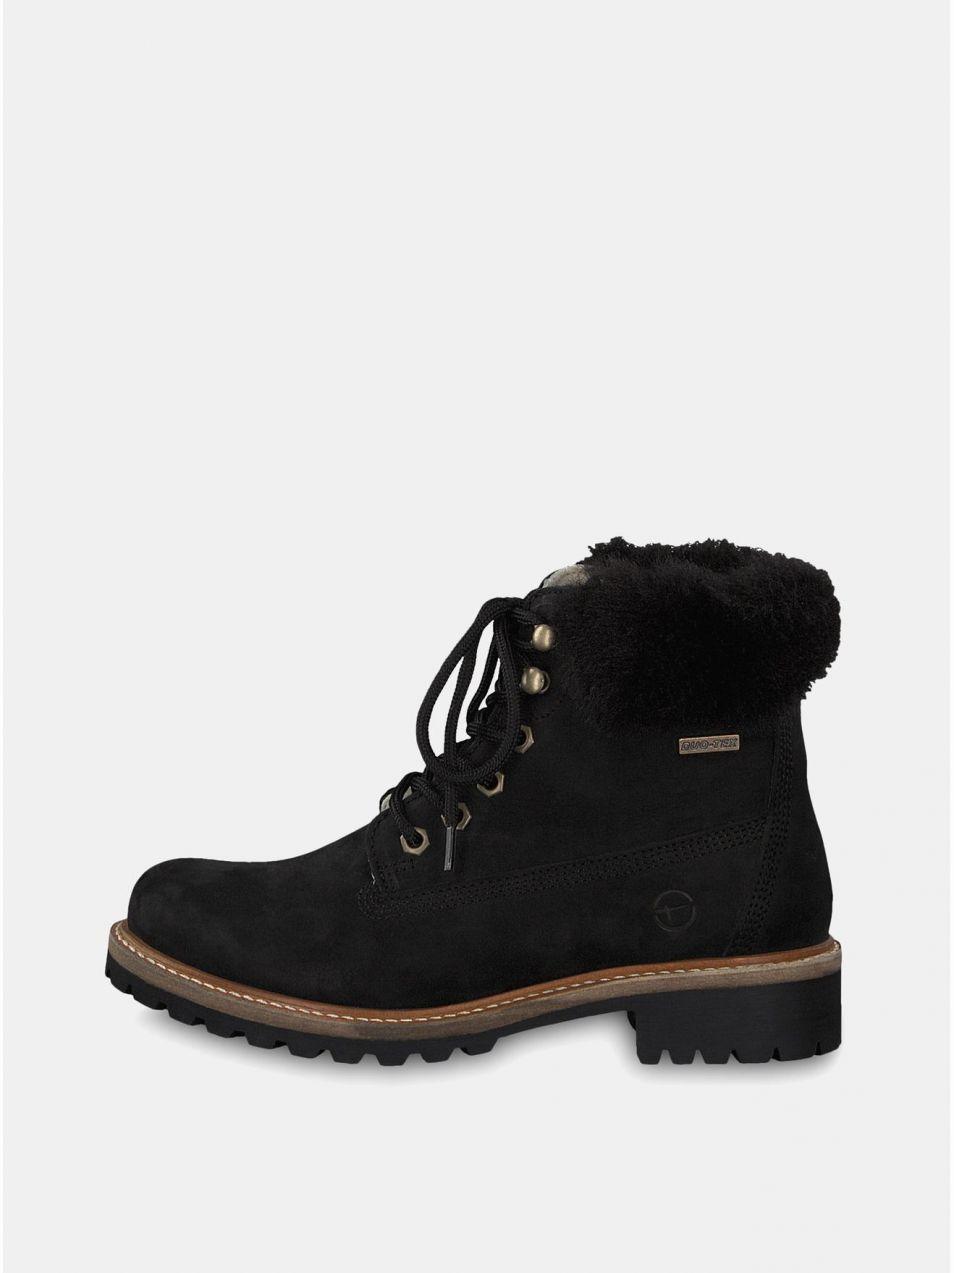 6583b158ee1c Čierne kožené členkové nepremokavé zimné topánky s vlnenou podšívkou  Tamaris značky Tamaris - Lovely.sk